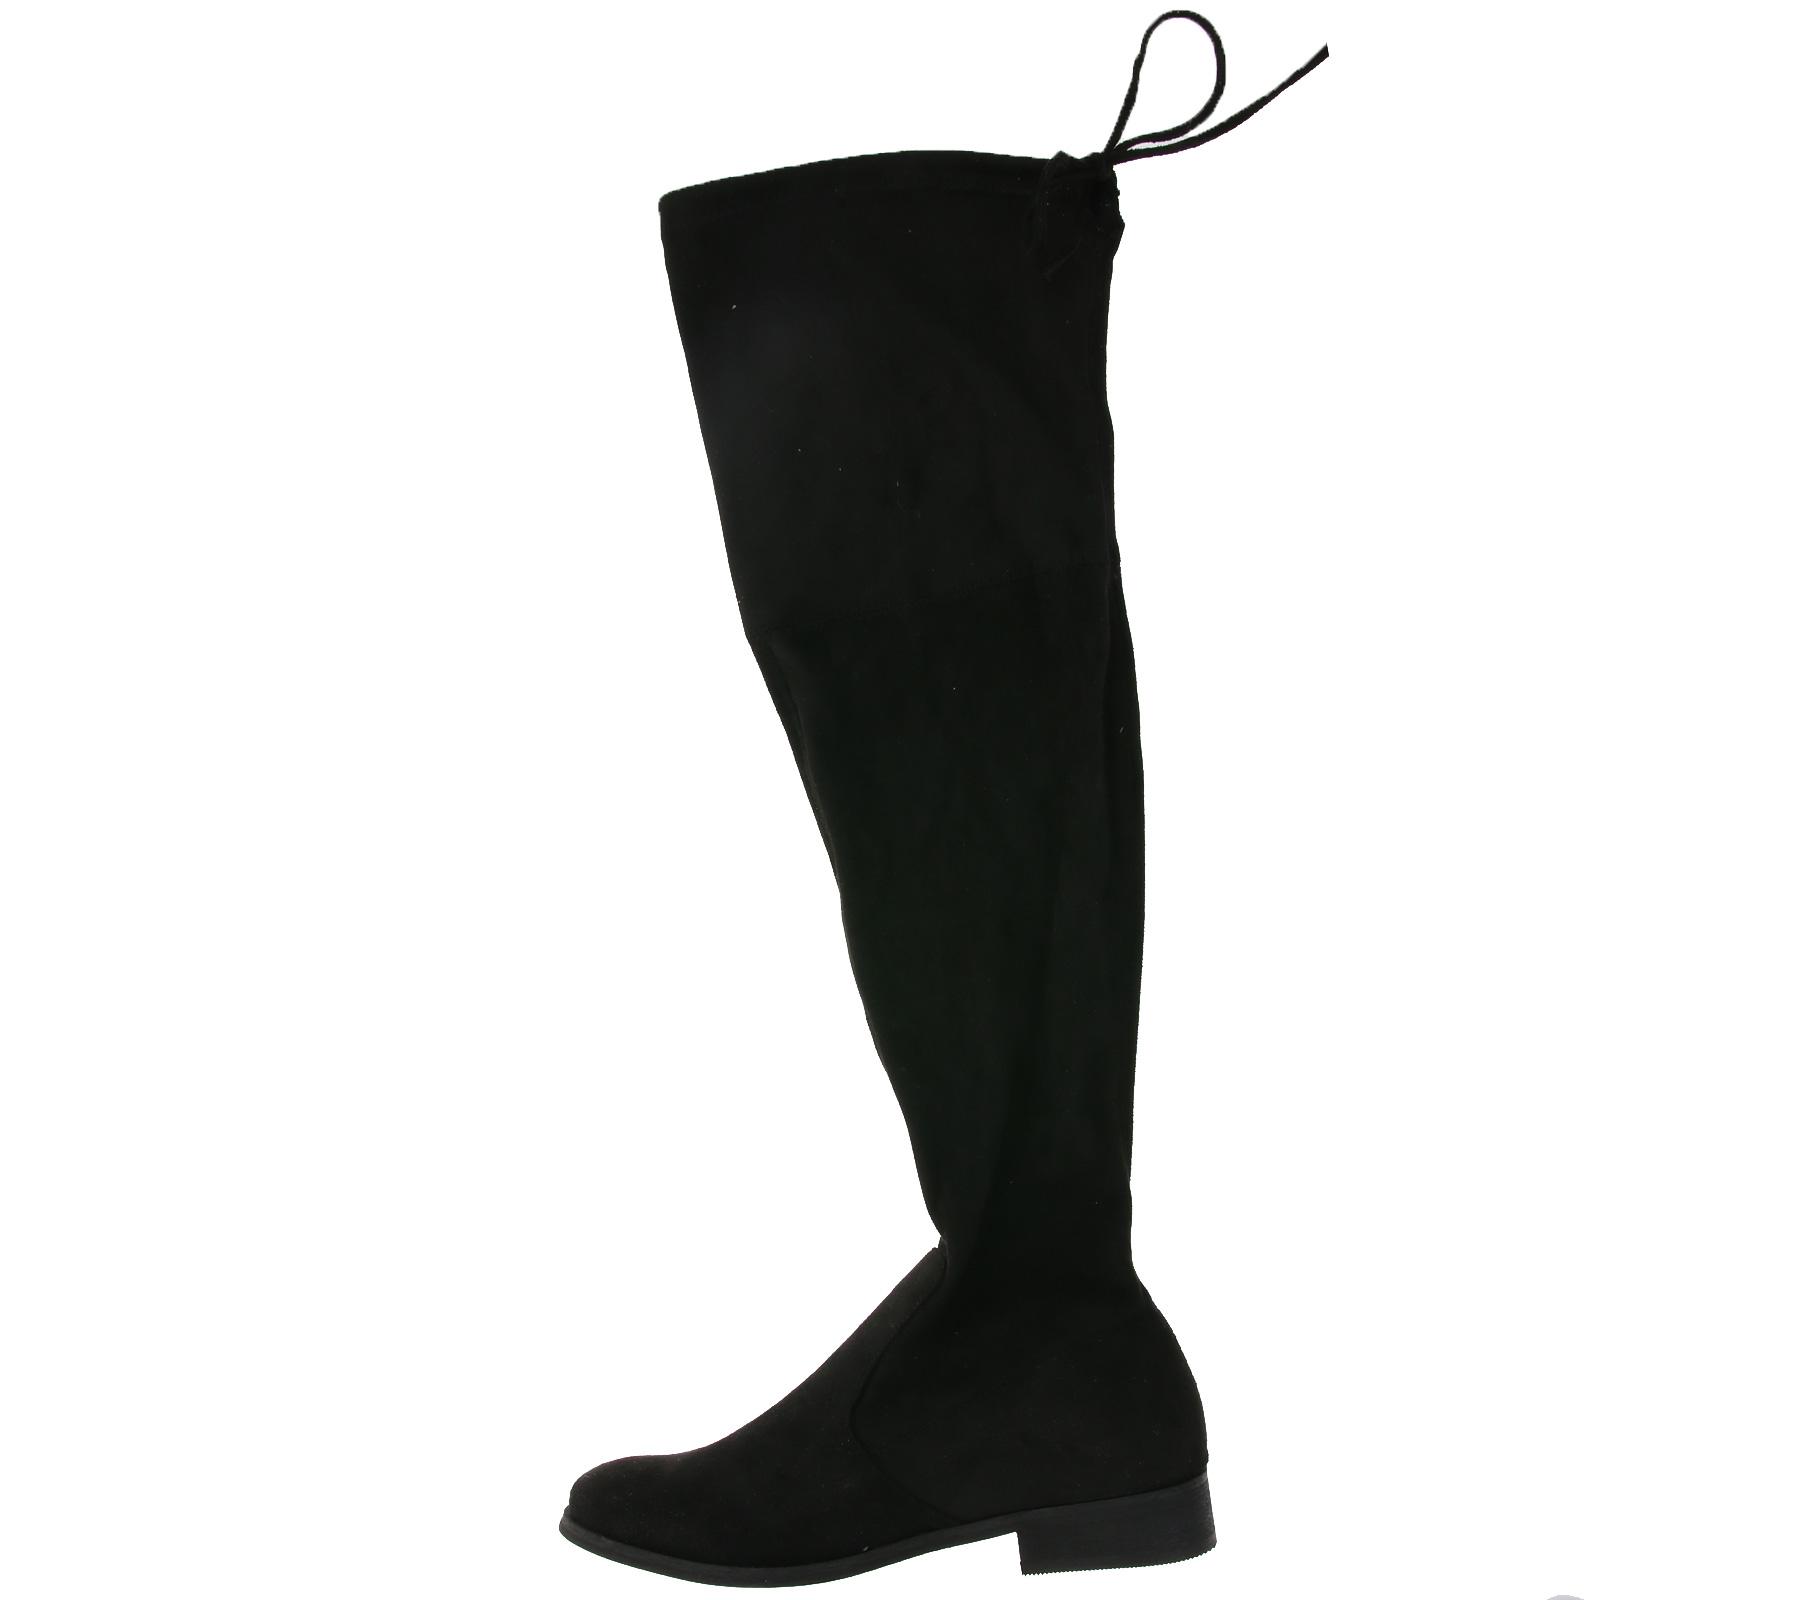 buy popular 26a59 c3f87 Boots & Stiefel für Damen SALE - Online Shop & Outlet 46 | O46